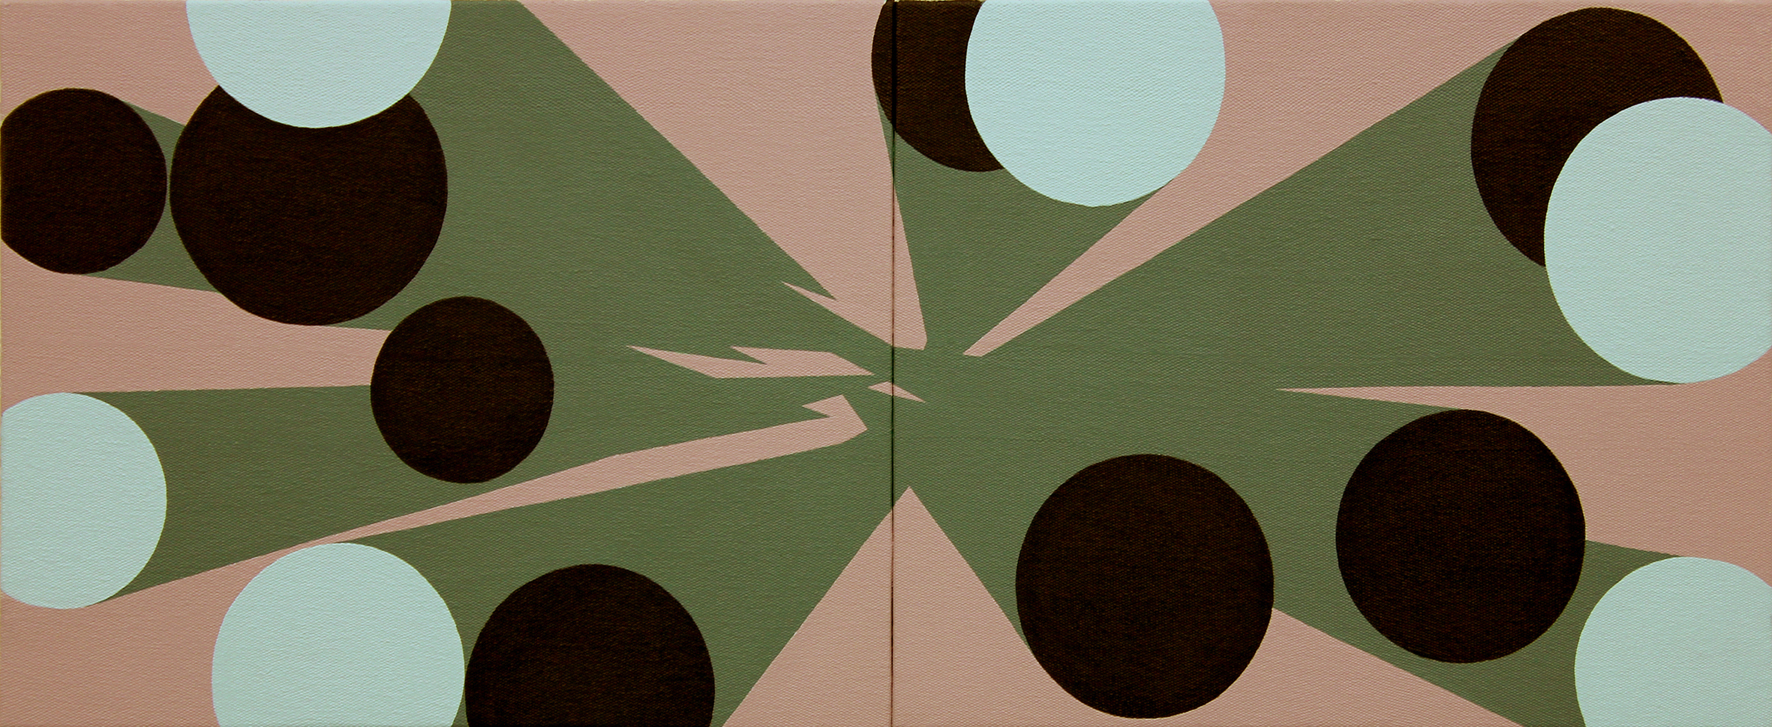 Memorias Imaginadas, 2014, acrylic on canvas, 33 x 82 cm.